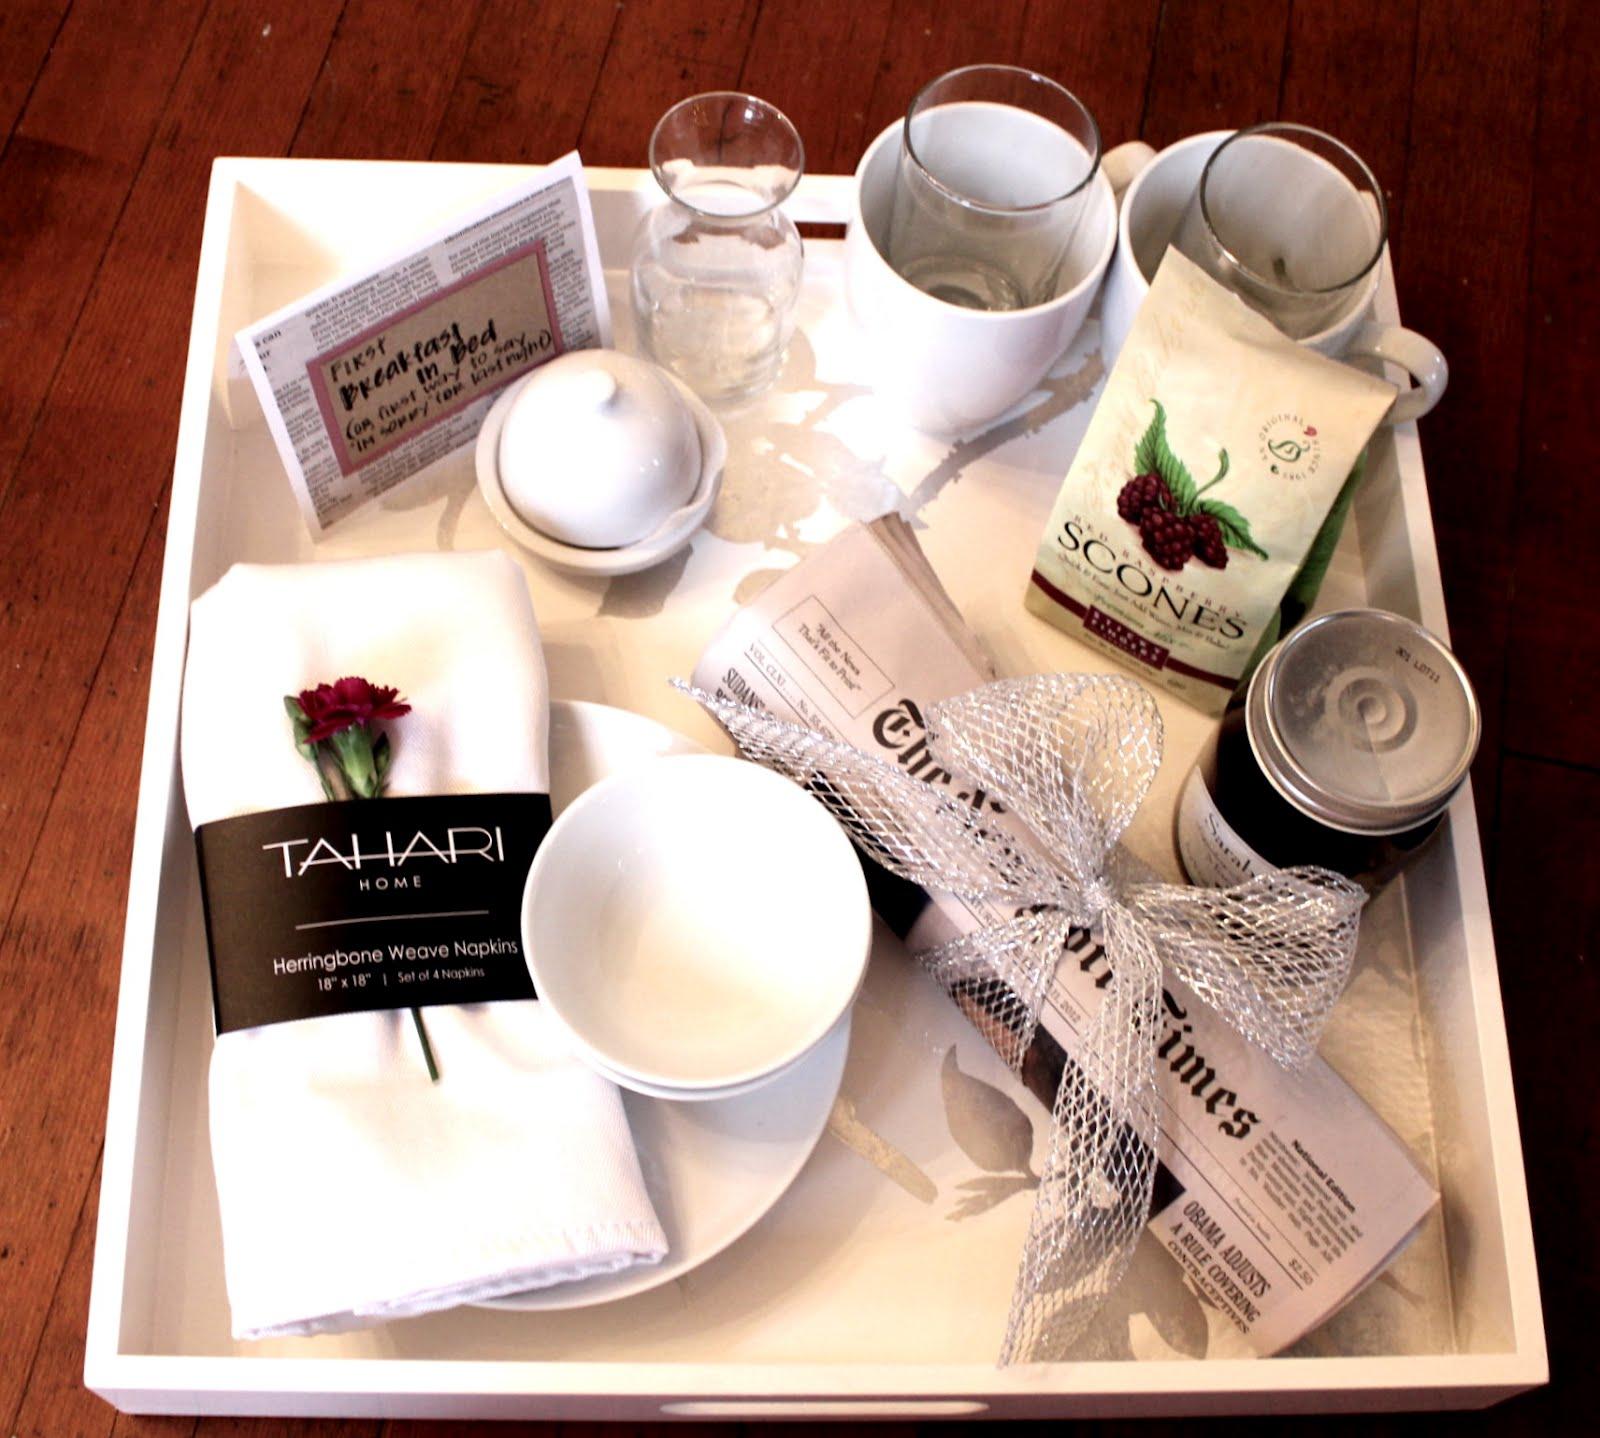 House of josephine breakfast in bed gift idea for Breakfast in bed ideas